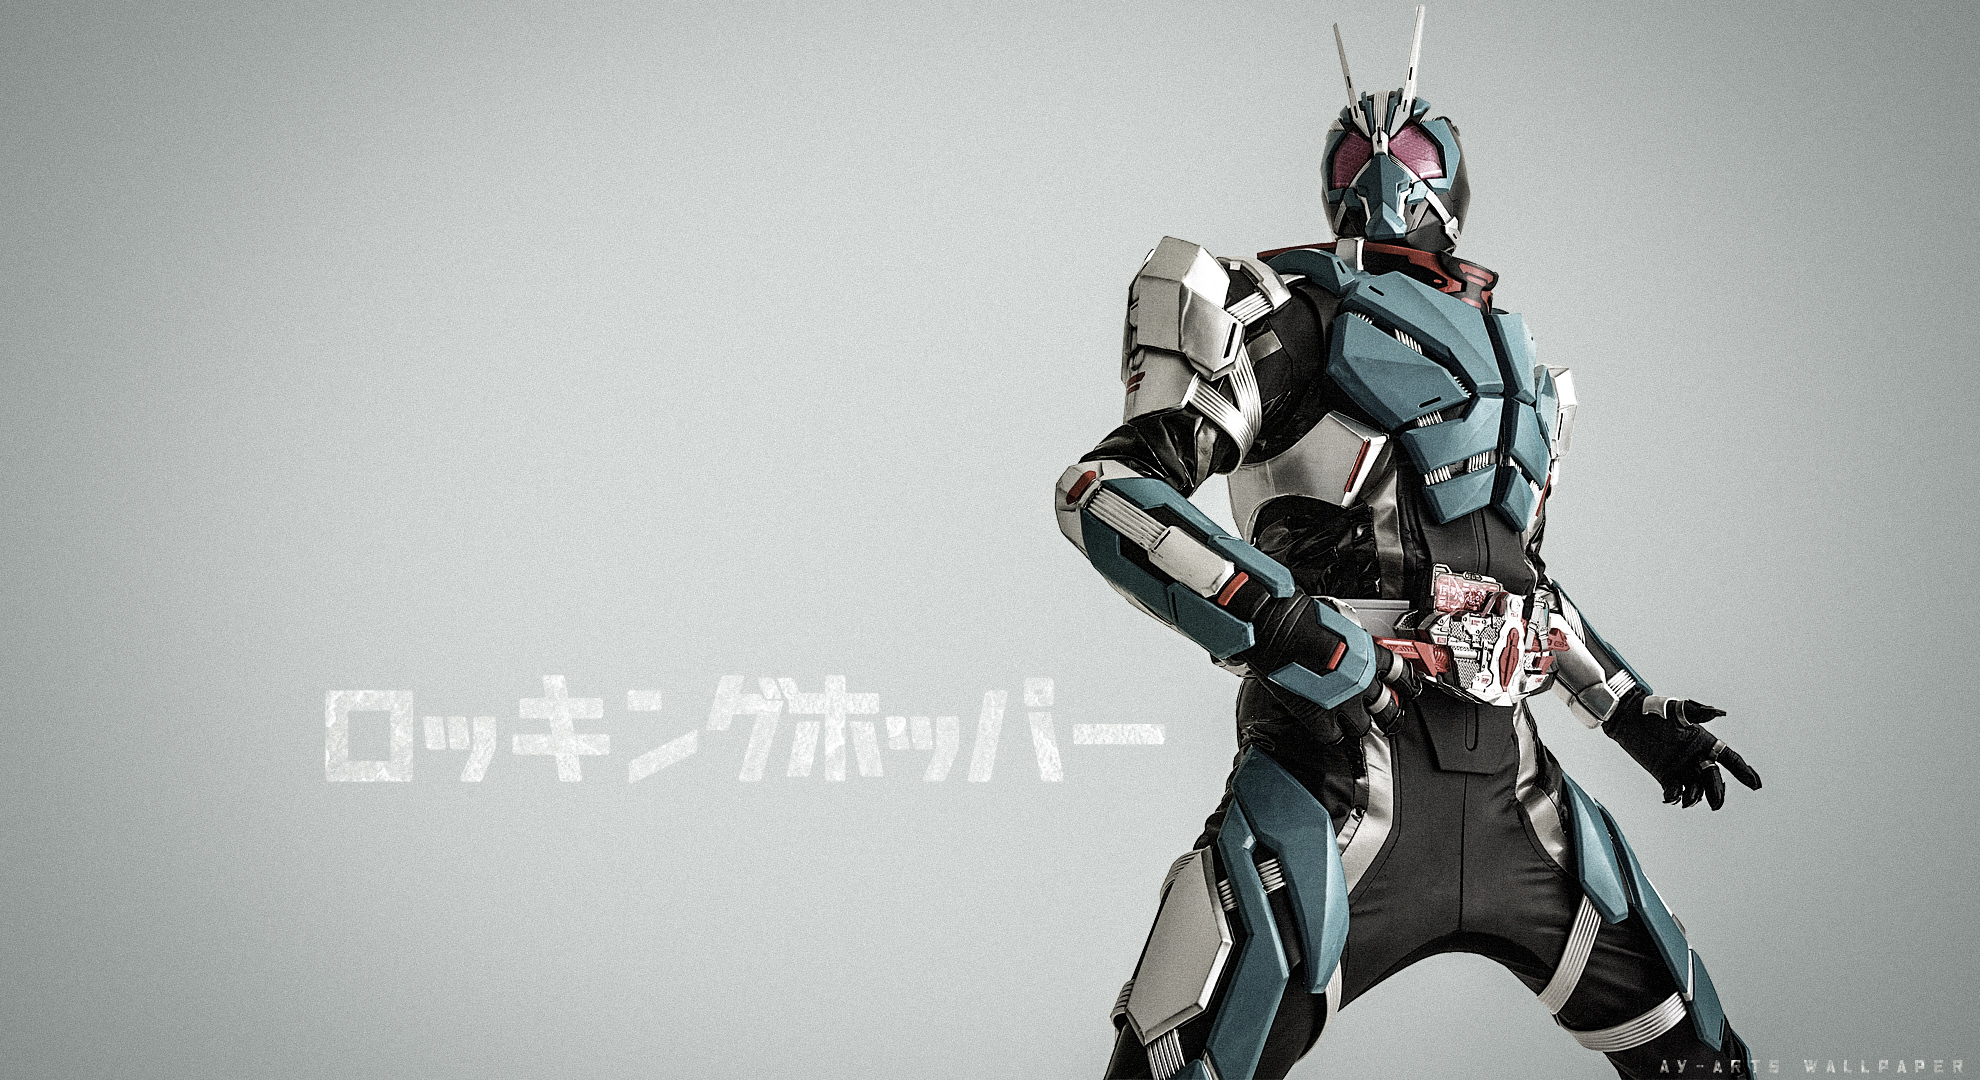 General 1980x1080 kamen rider Kamen Rider Zero One ichigata tokusatsu